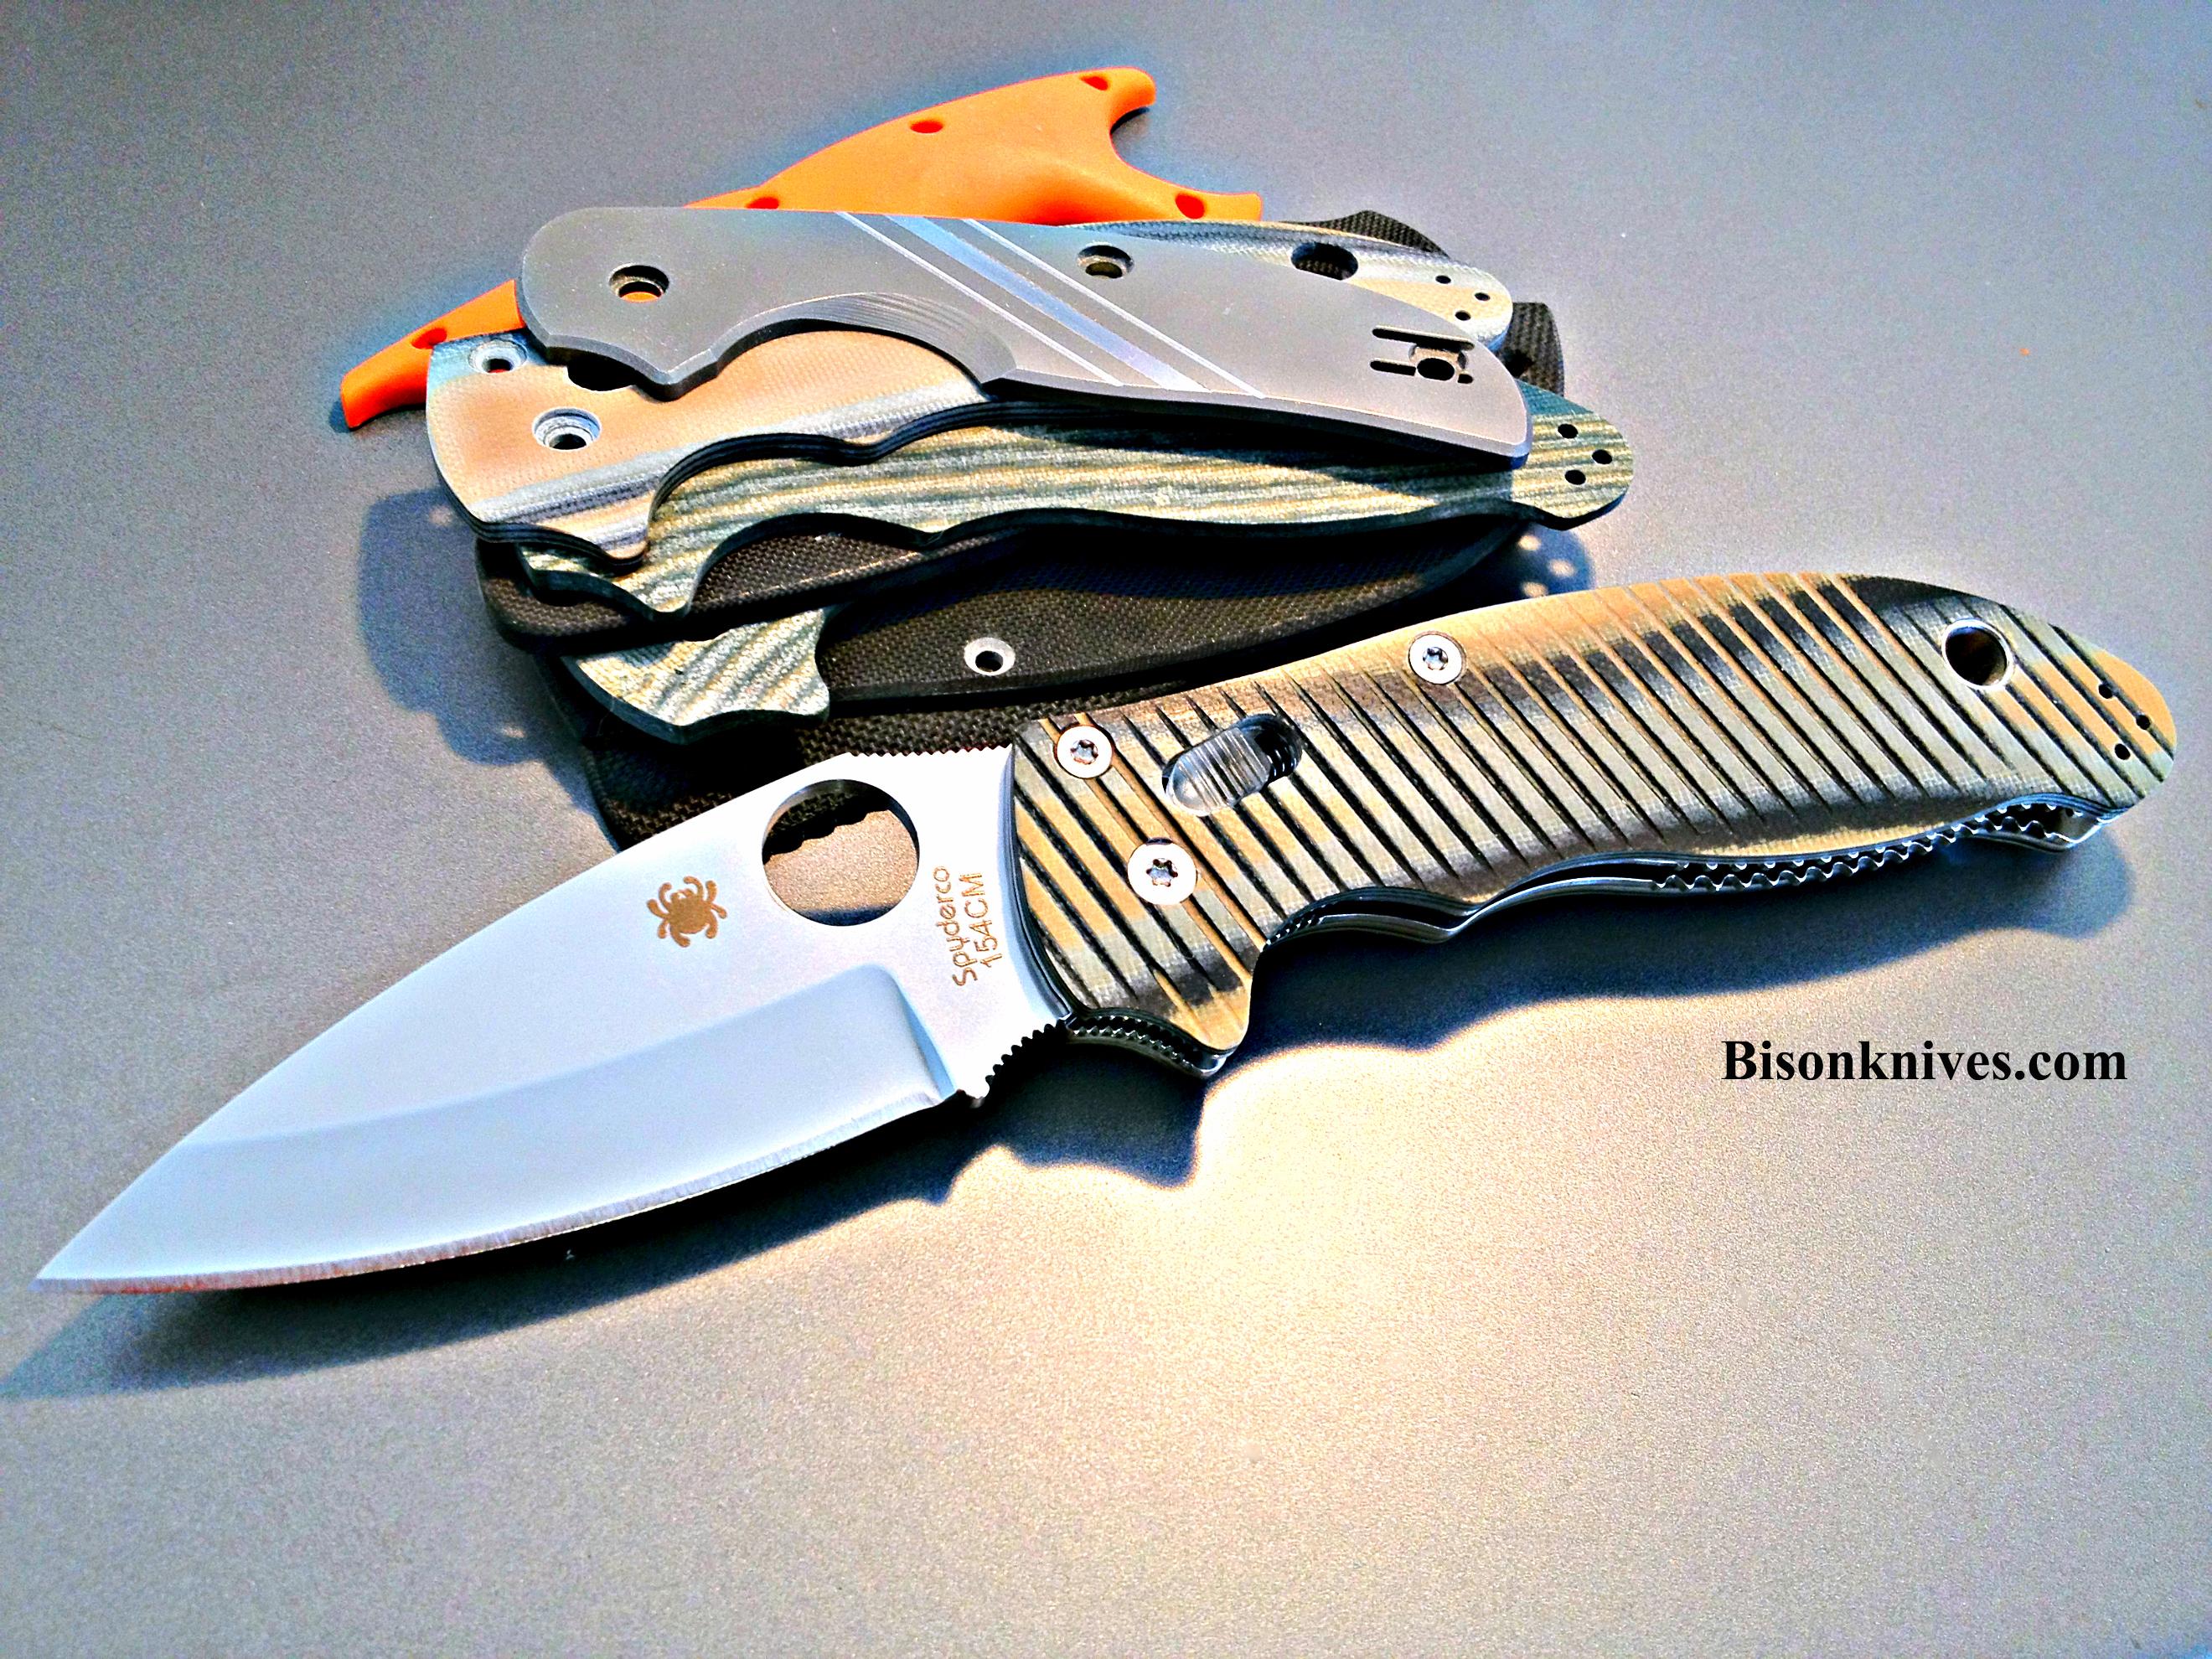 Bison Knives - photo